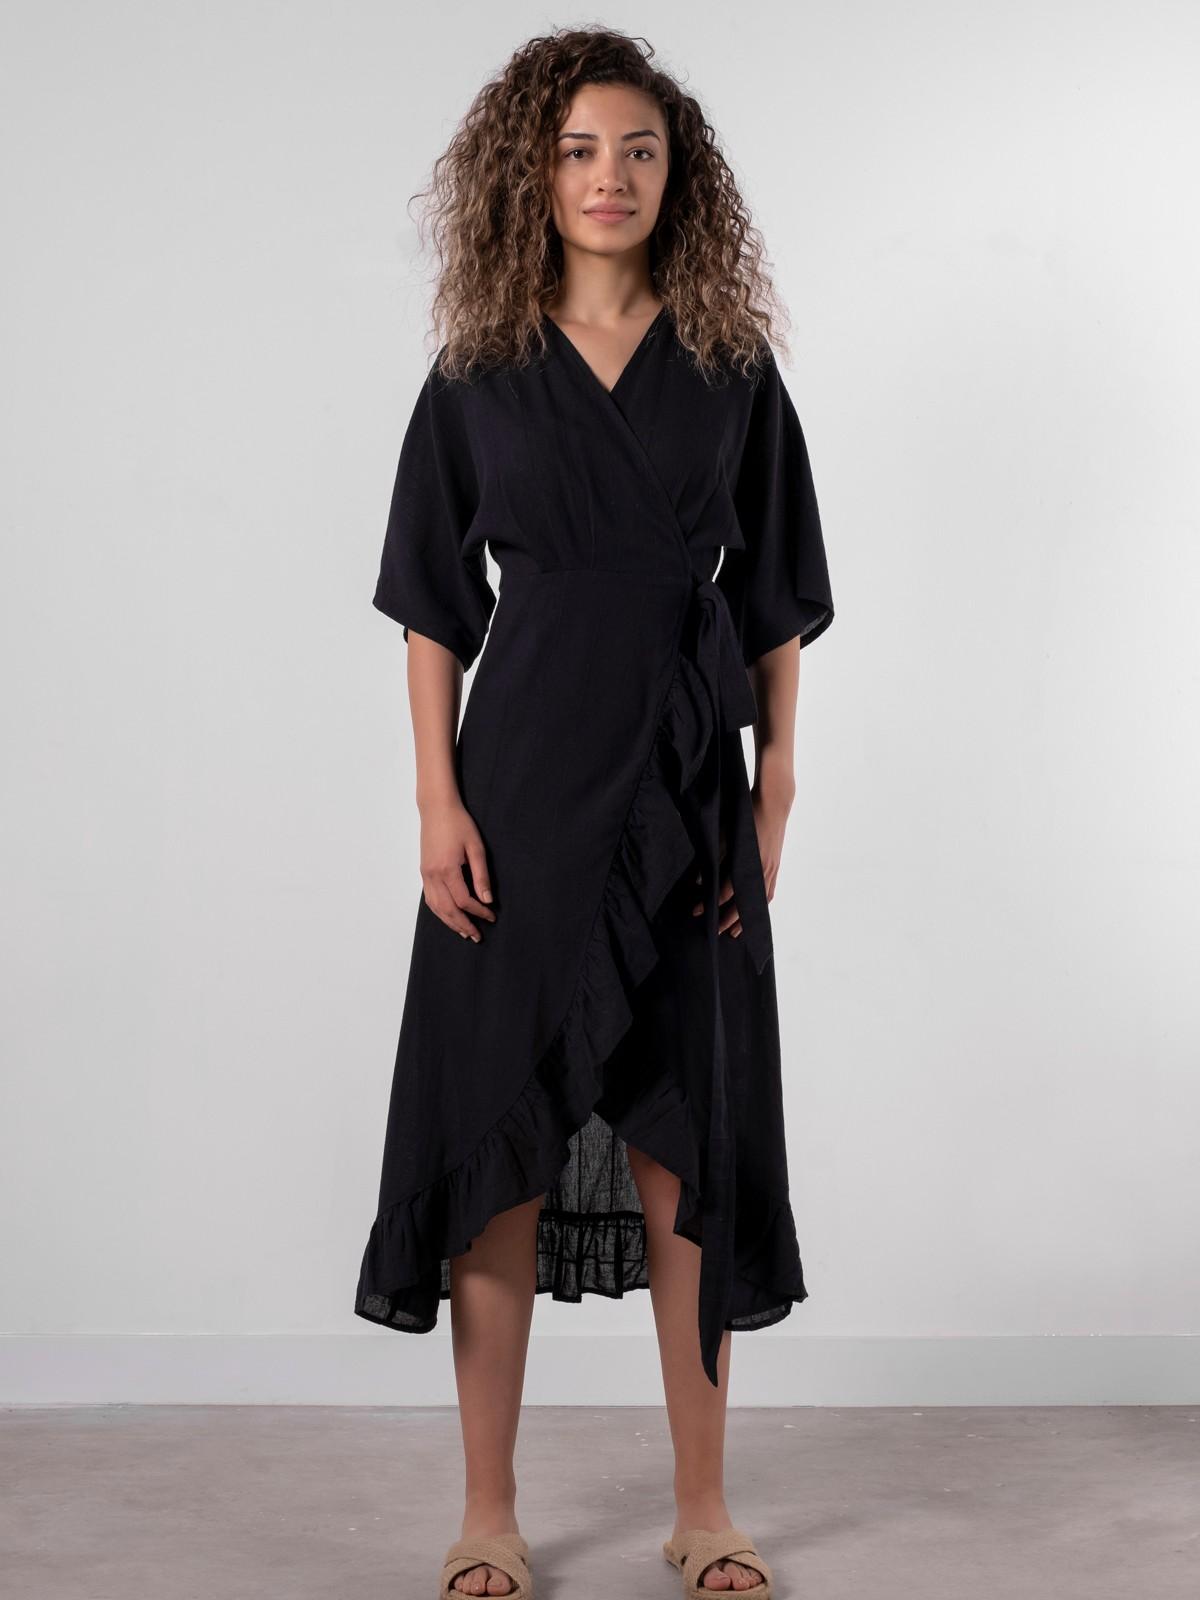 frilled-dress-siyah1-1200x1600w